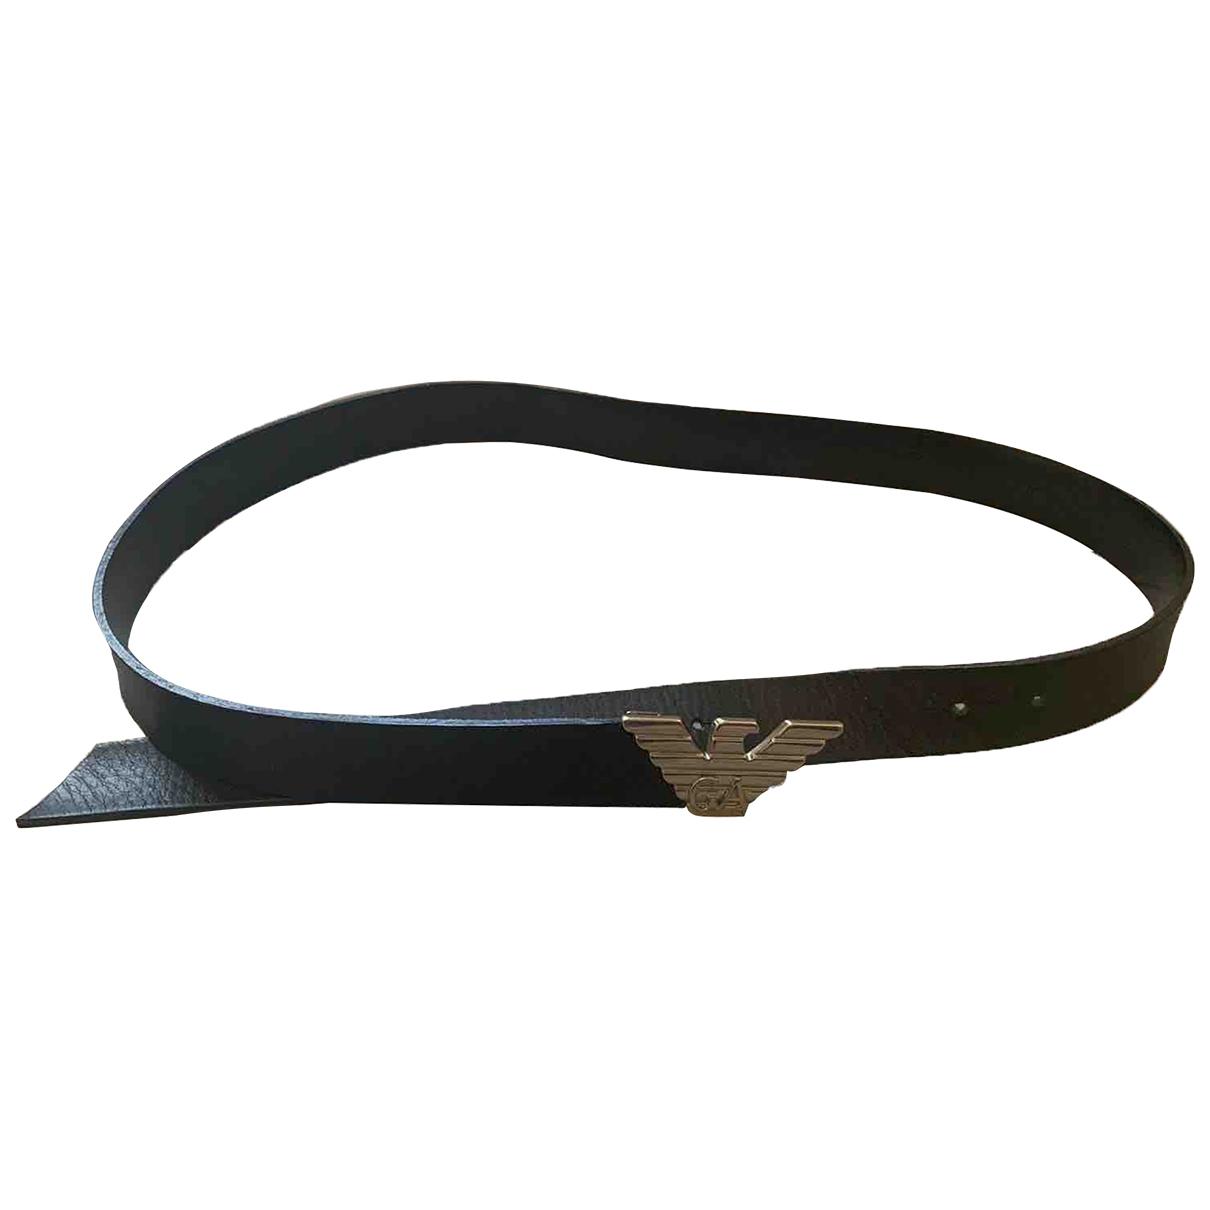 Armani Collezioni \N Black Leather belt for Women M International